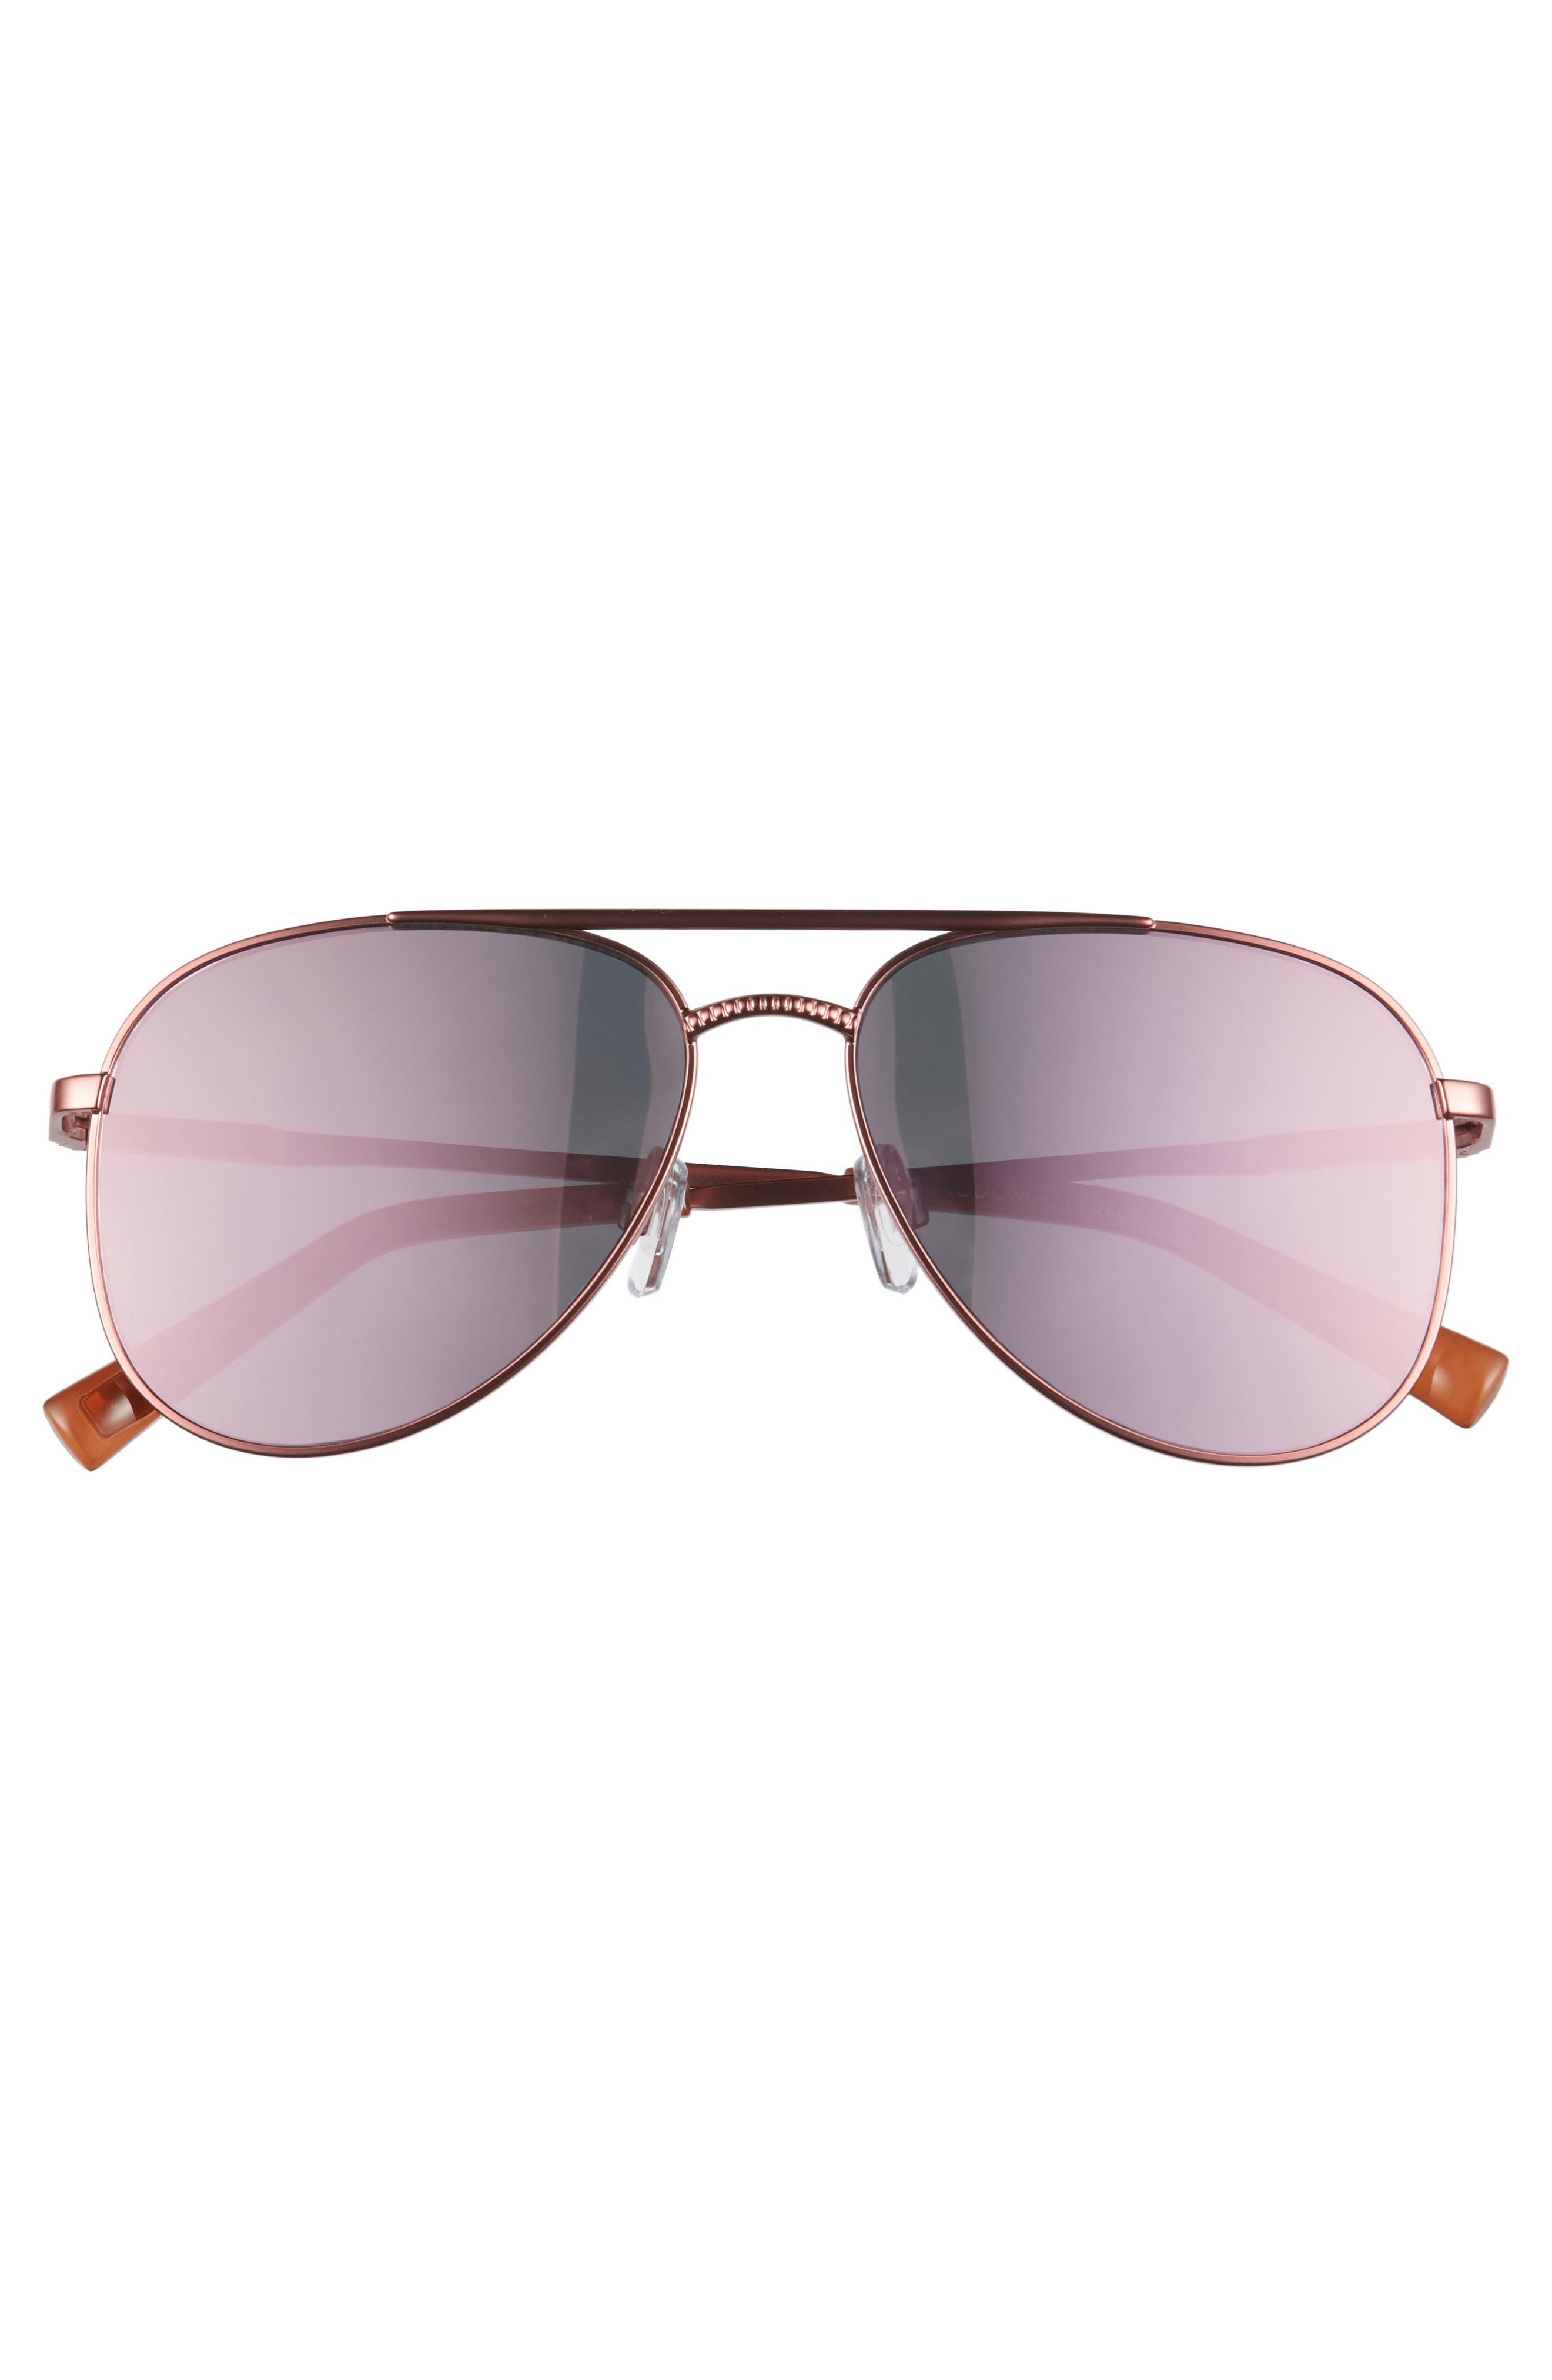 Kingdom 57mm Polarized Aviator Sunglasses,                             Alternate thumbnail 3, color,                             650